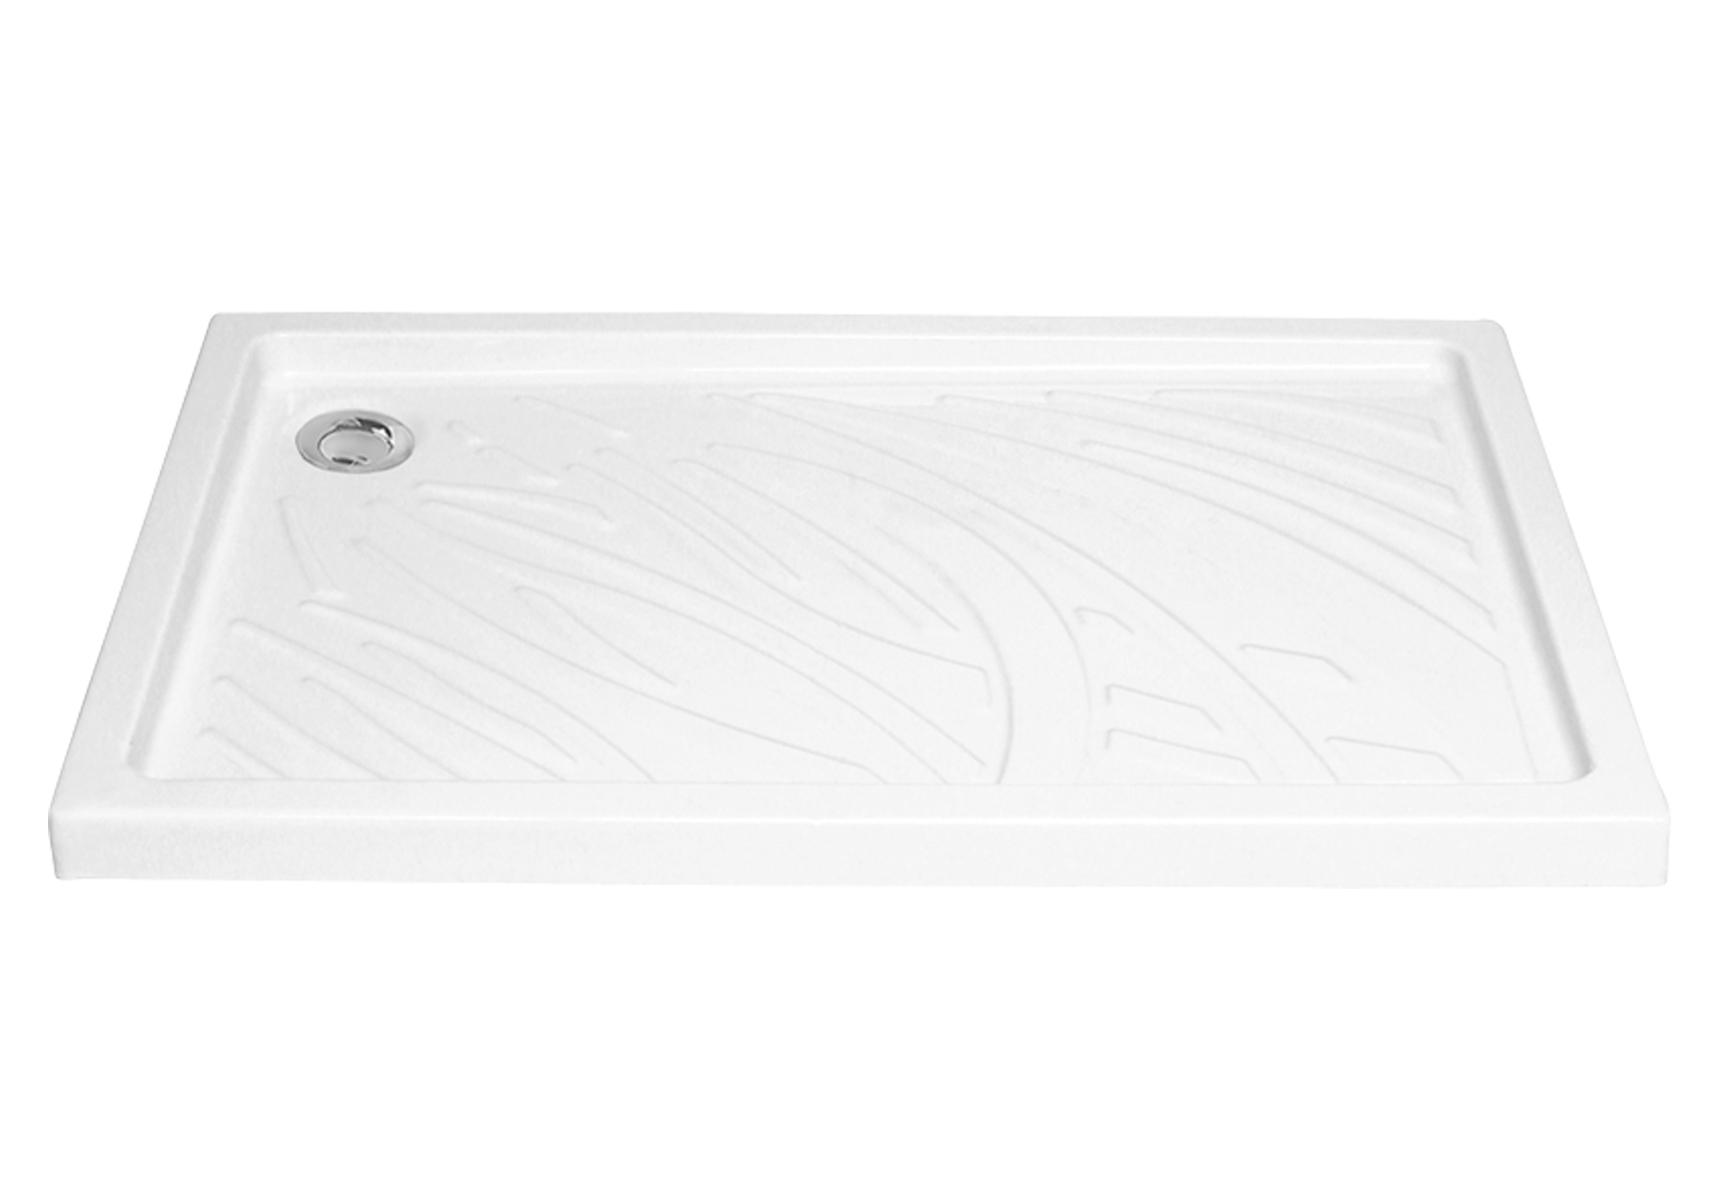 Arkitekt receveur à encastrer ou à poser fond extra plat, VitrA Antislip, 120  x  80 cm, blanc